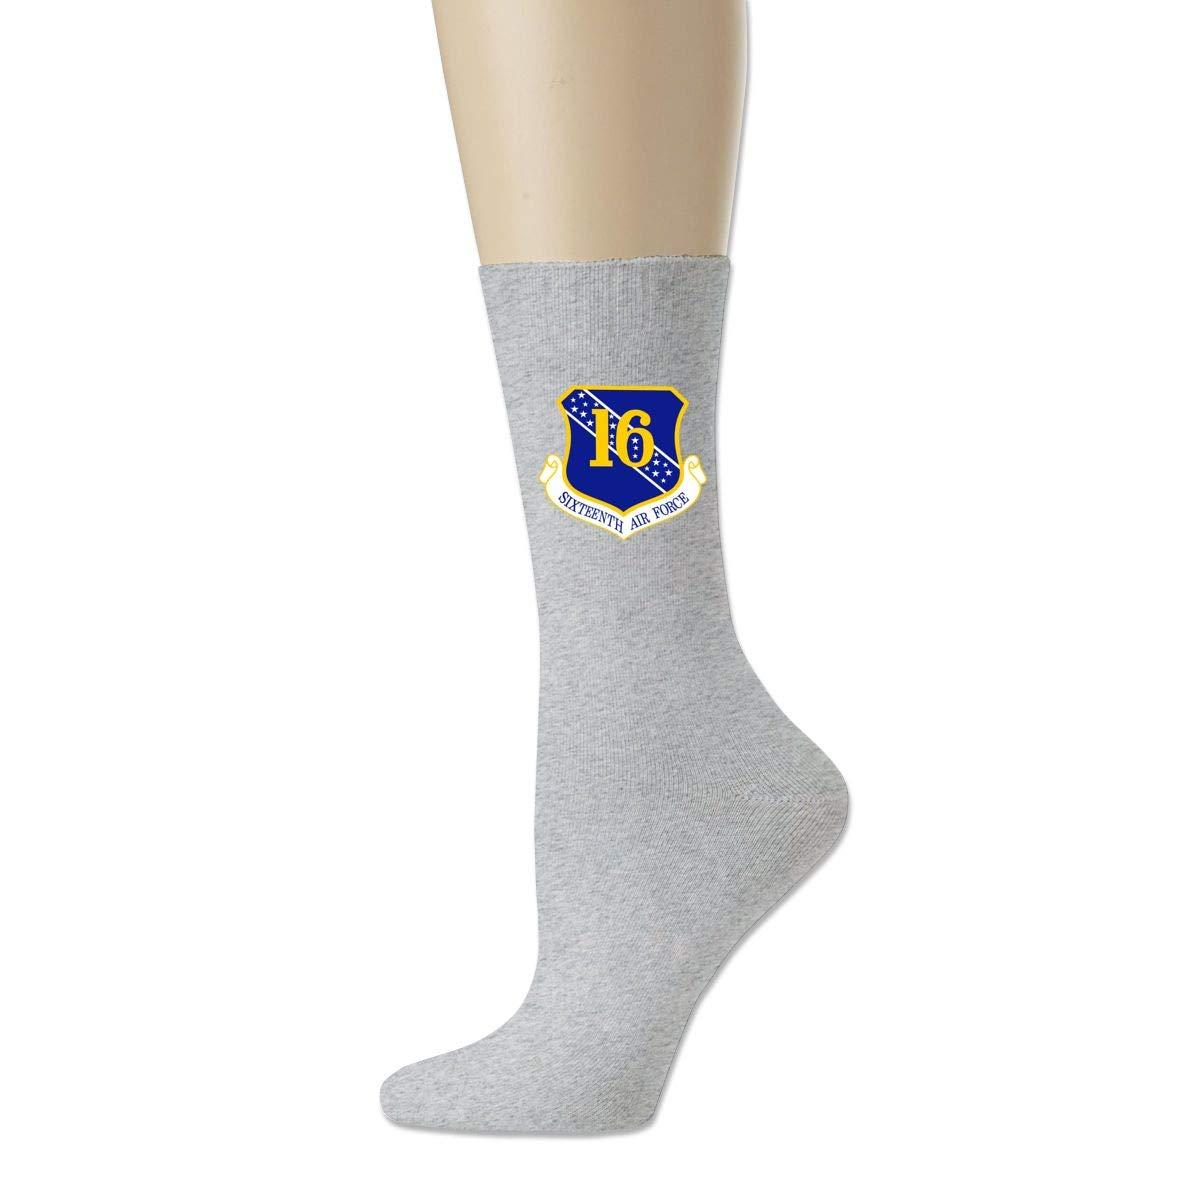 16th Air Force Mens Pack Crew Socks Tube Stockings Athletic Socks